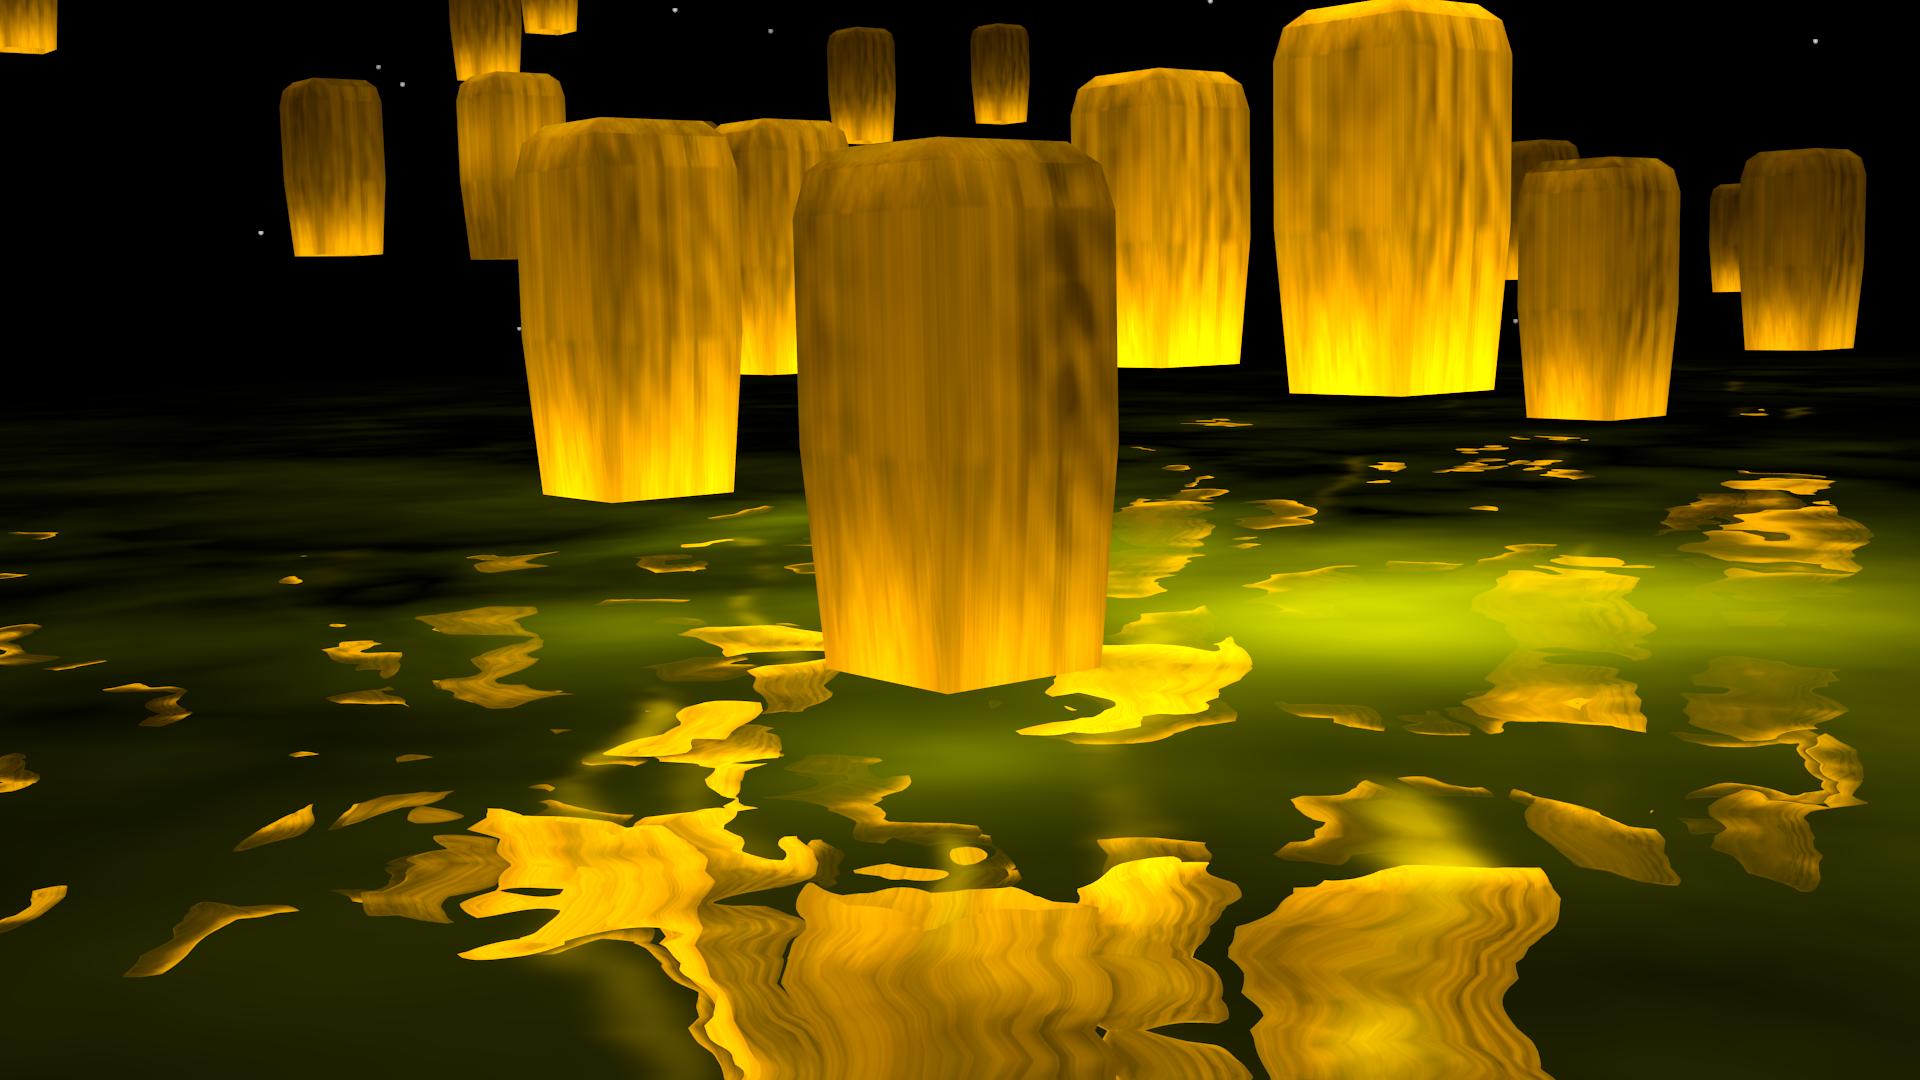 Paper Lanterns 01 By Technohippy On DeviantArt For Lantern Wallpaper 289hul